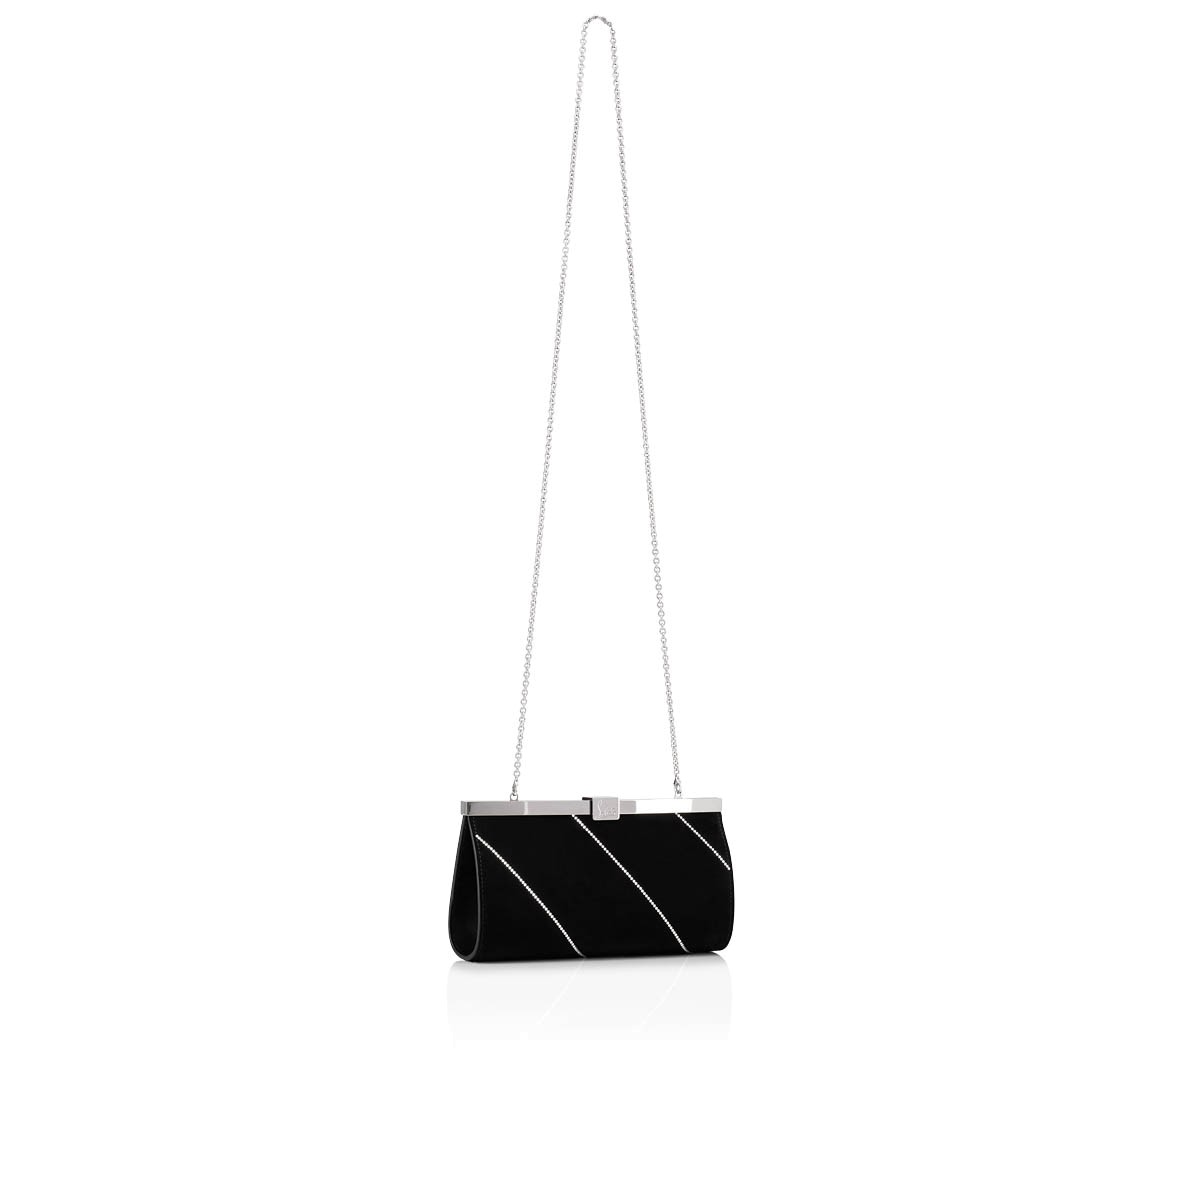 Bags - Petite Minaudière Palmette - Christian Louboutin